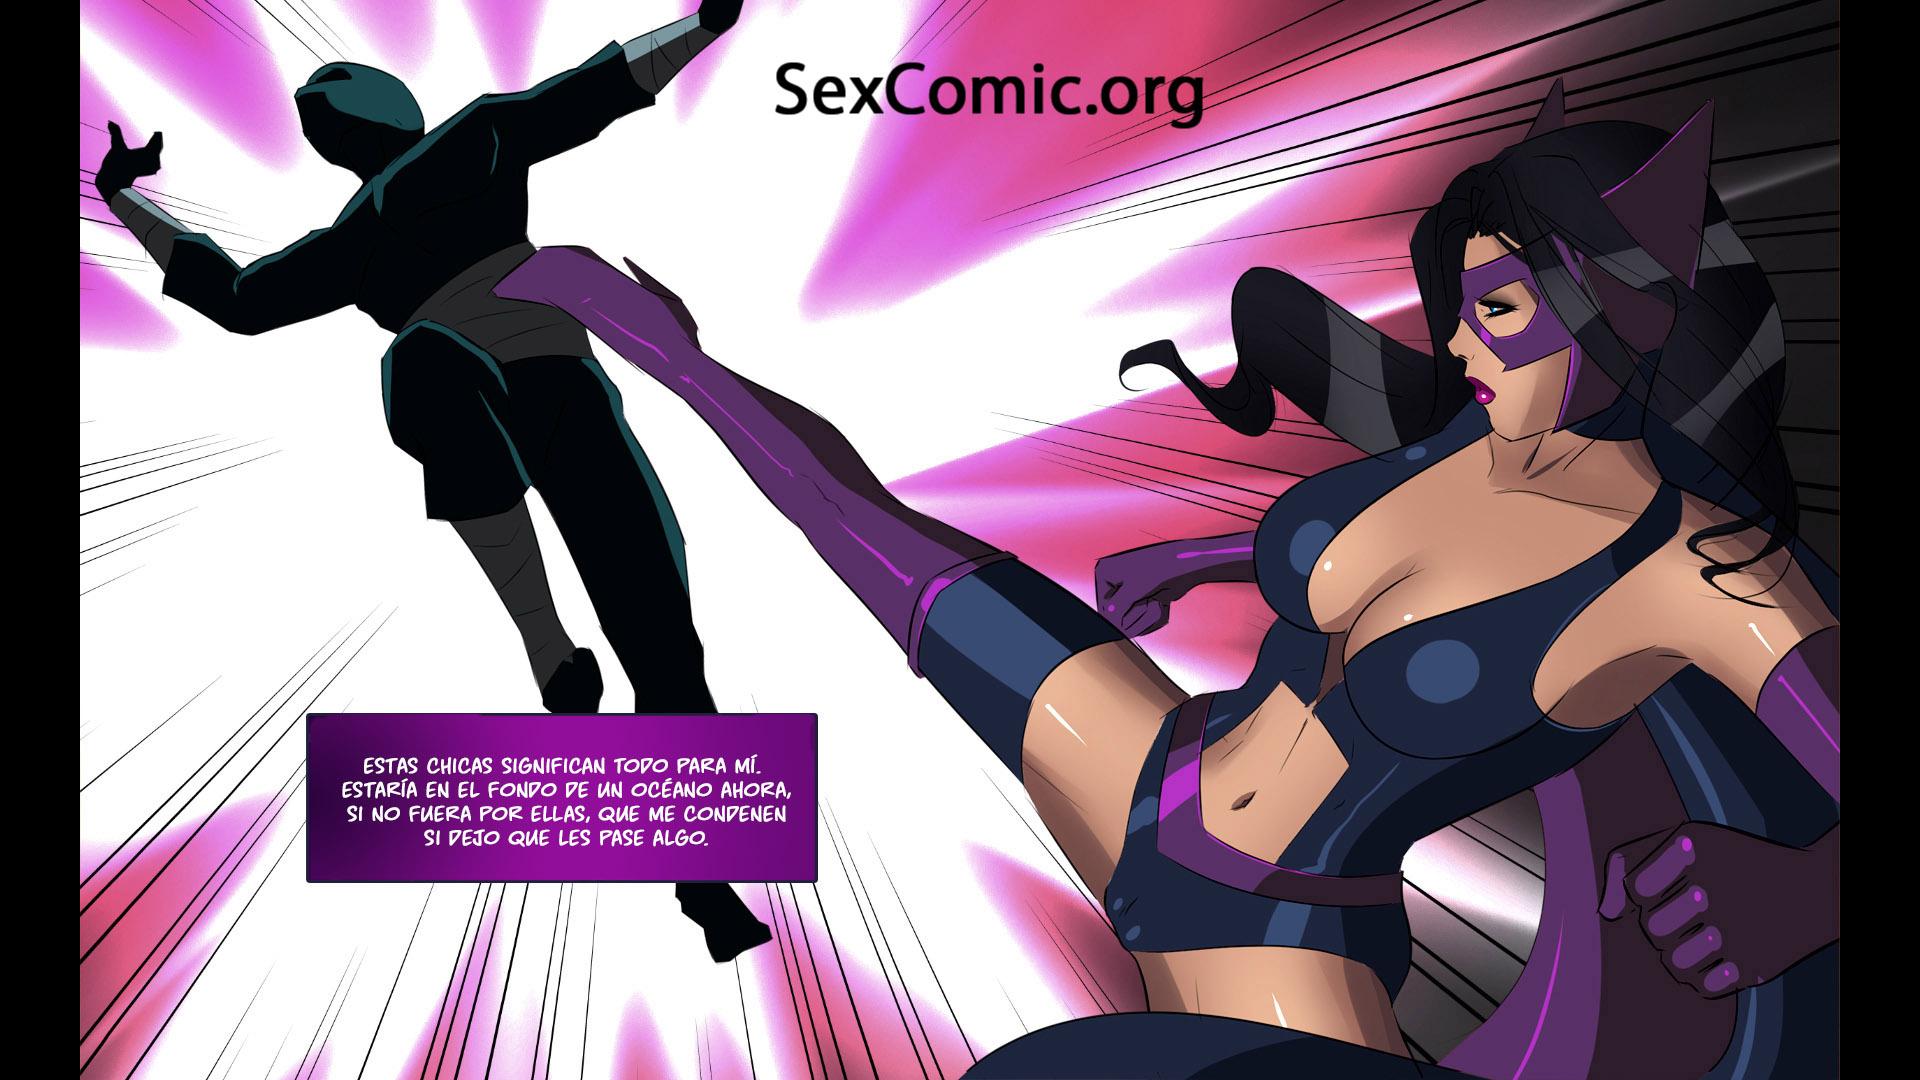 comic-xxx-super-heroes-marvel-historias-eroticas-mangas-sexuales-hentai-videos-pono-comics-de-incesto-gratis-7